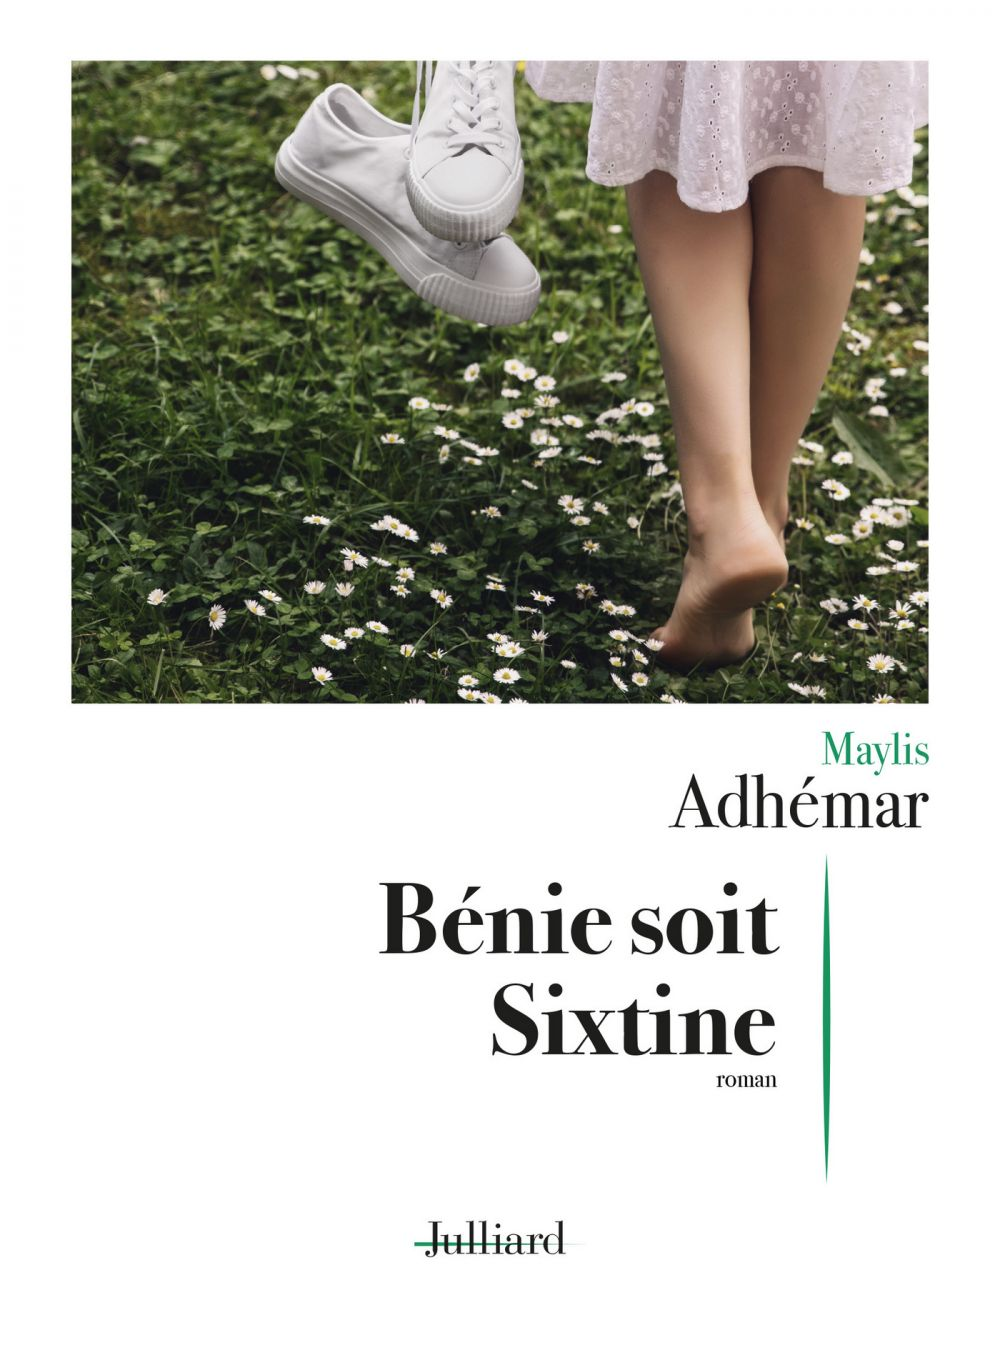 Bénie soit Sixtine | ADHÉMAR, Maylis. Auteur